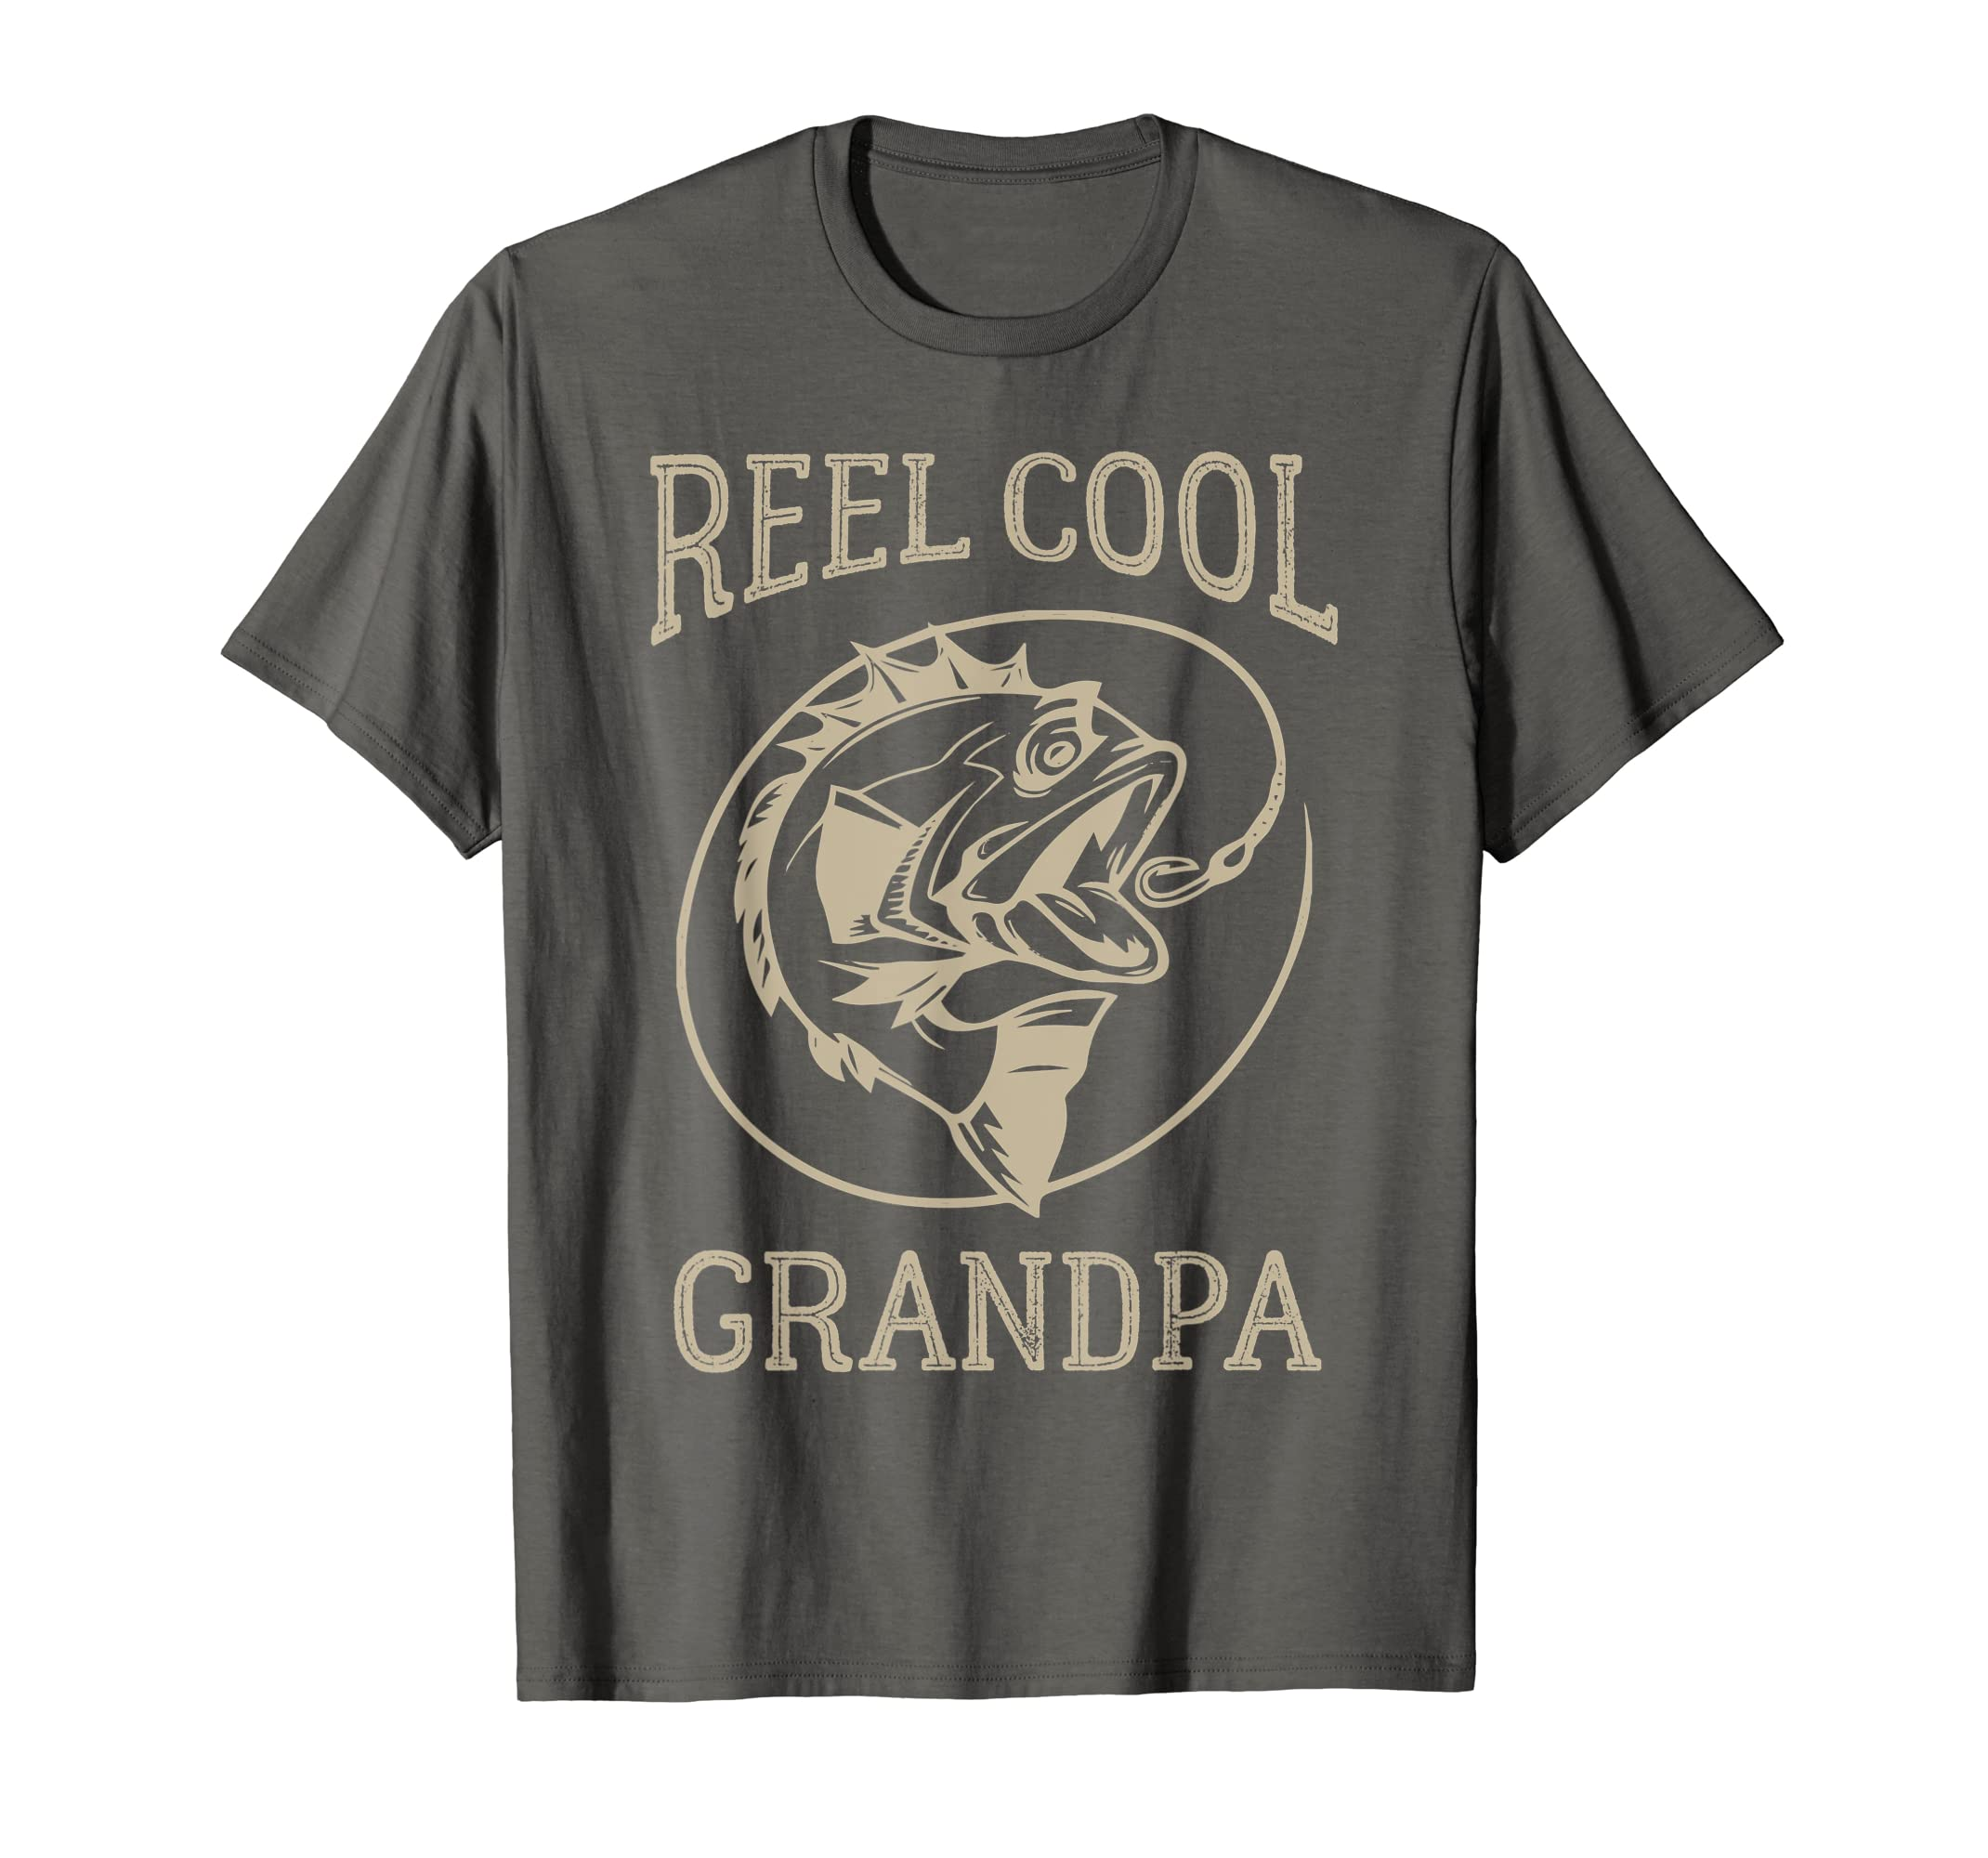 fd69e431 Amazon.com: Mens Reel Cool Grandpa T-Shirt: Clothing